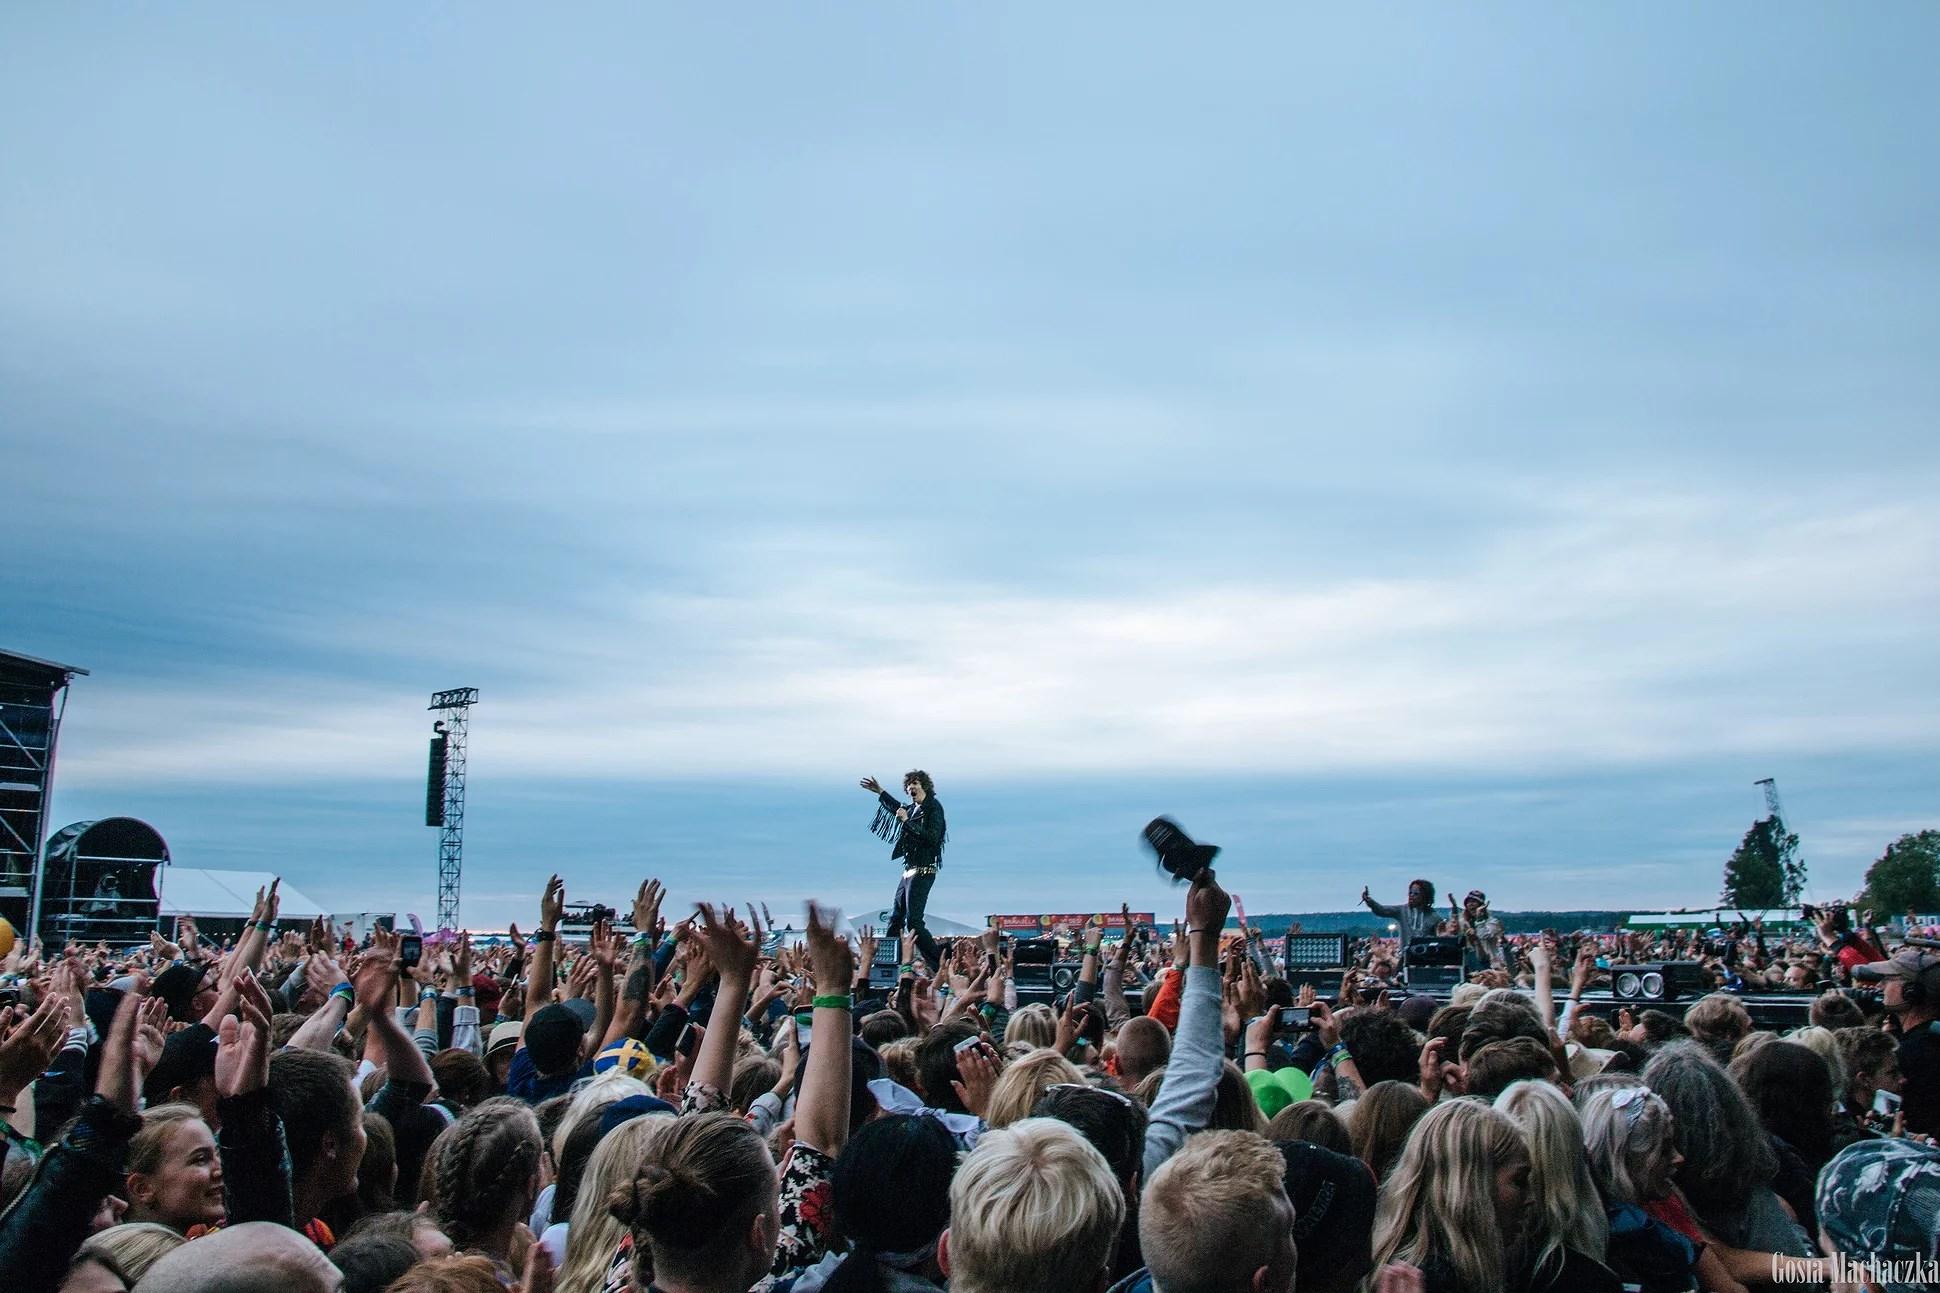 Bråvalla Day 3 // You Me at Six, Die Antwoord, Håkan Hellström & Travis Scott